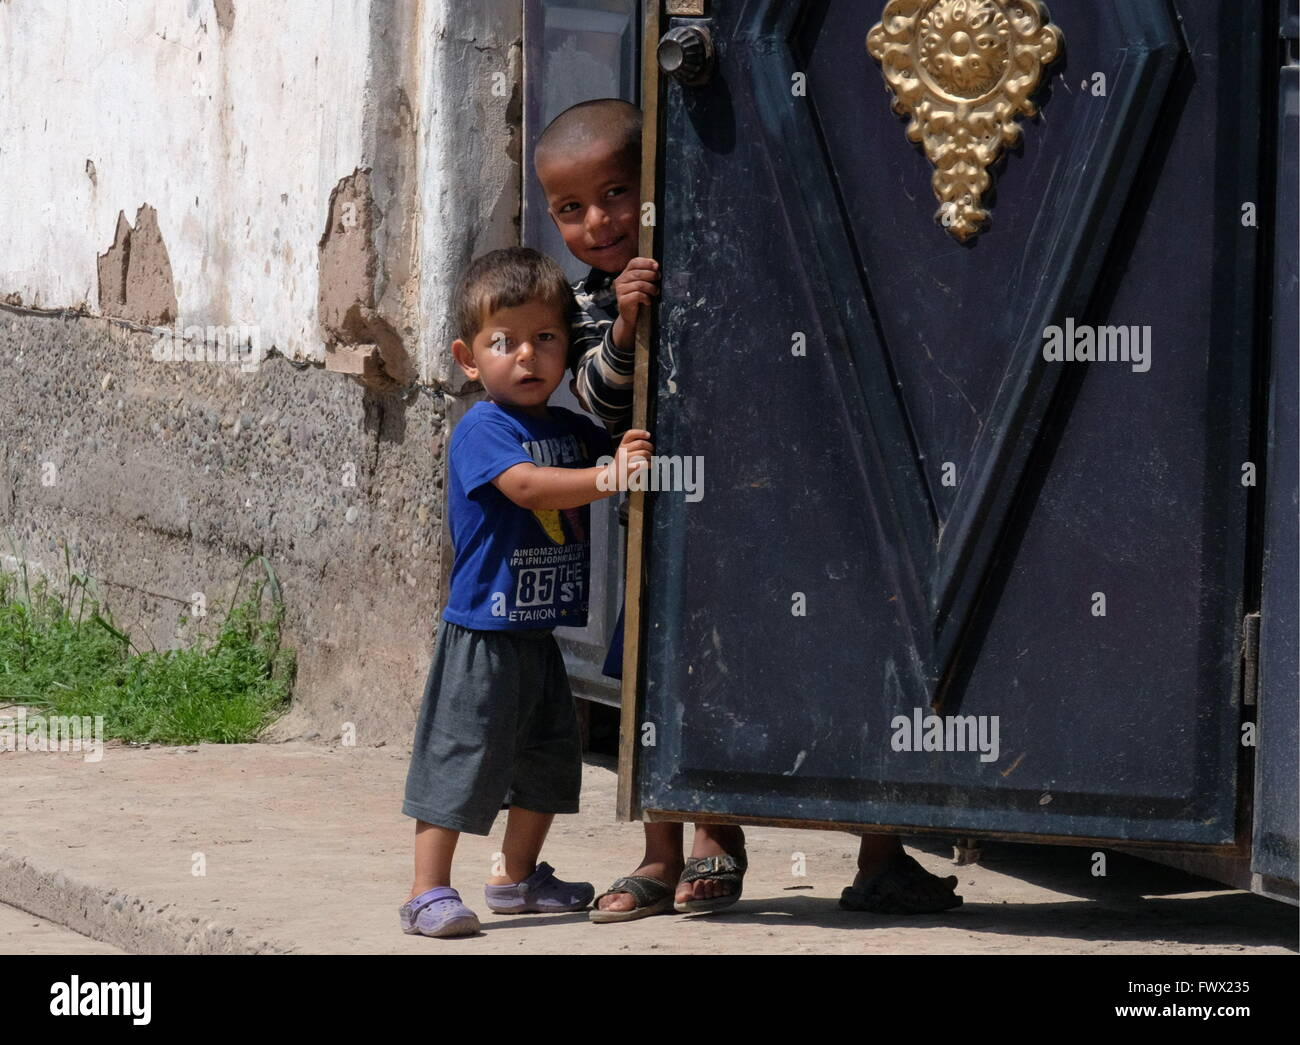 Khatlon Region, Tajikistan. 7th Apr, 2016. Gypsy children in the village (kishlak) of Zarkoron. Tajikistan's - Stock Image